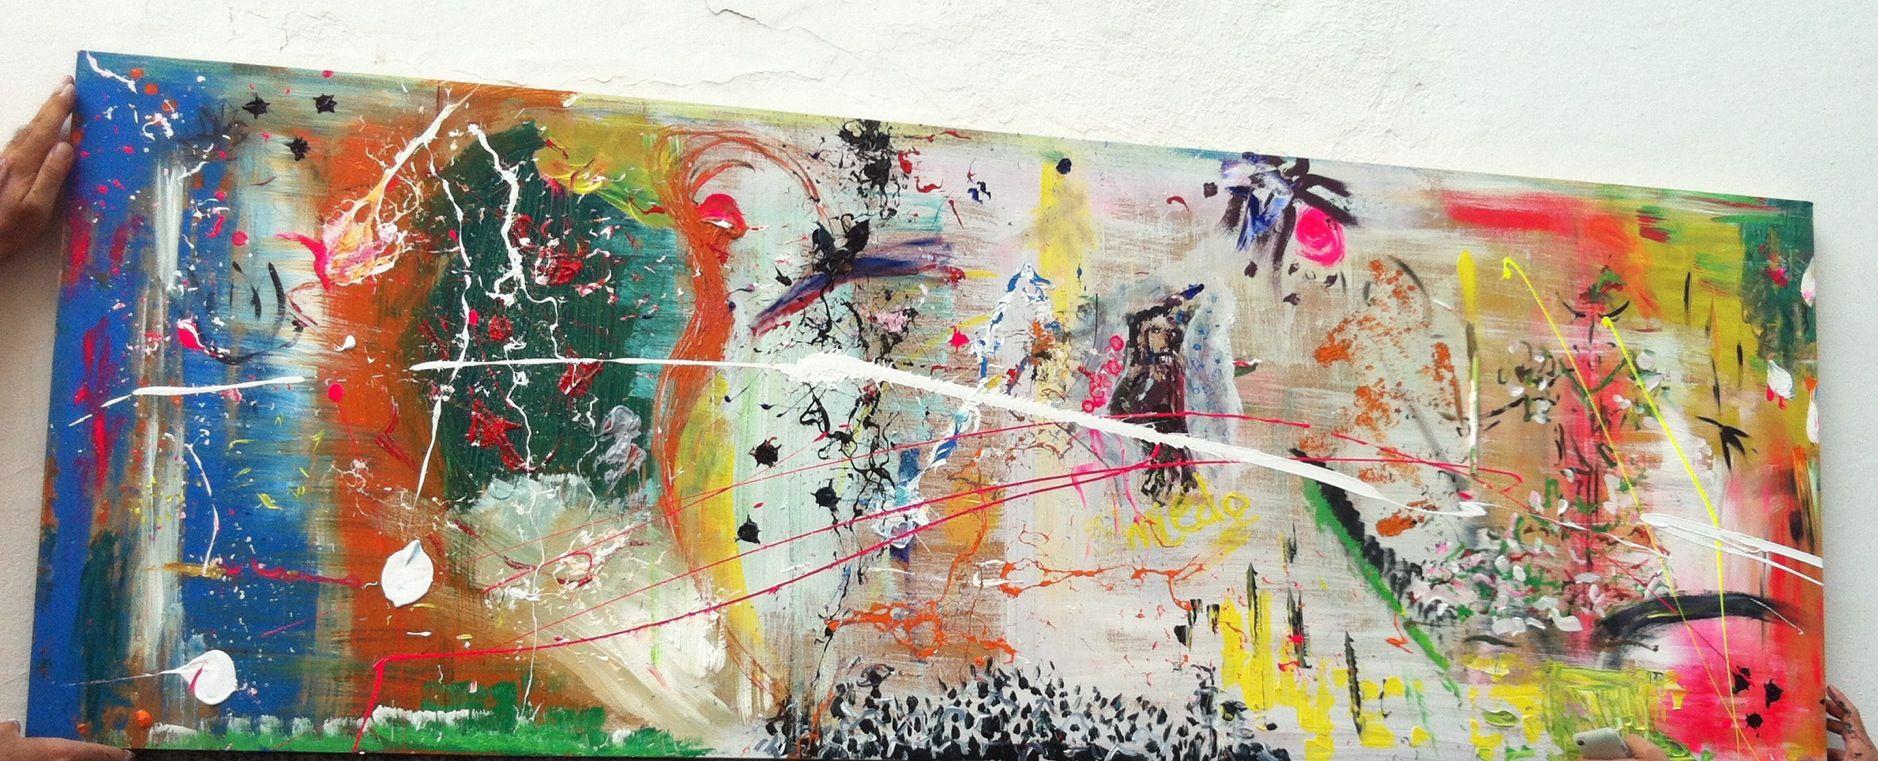 Abstracción colectiva